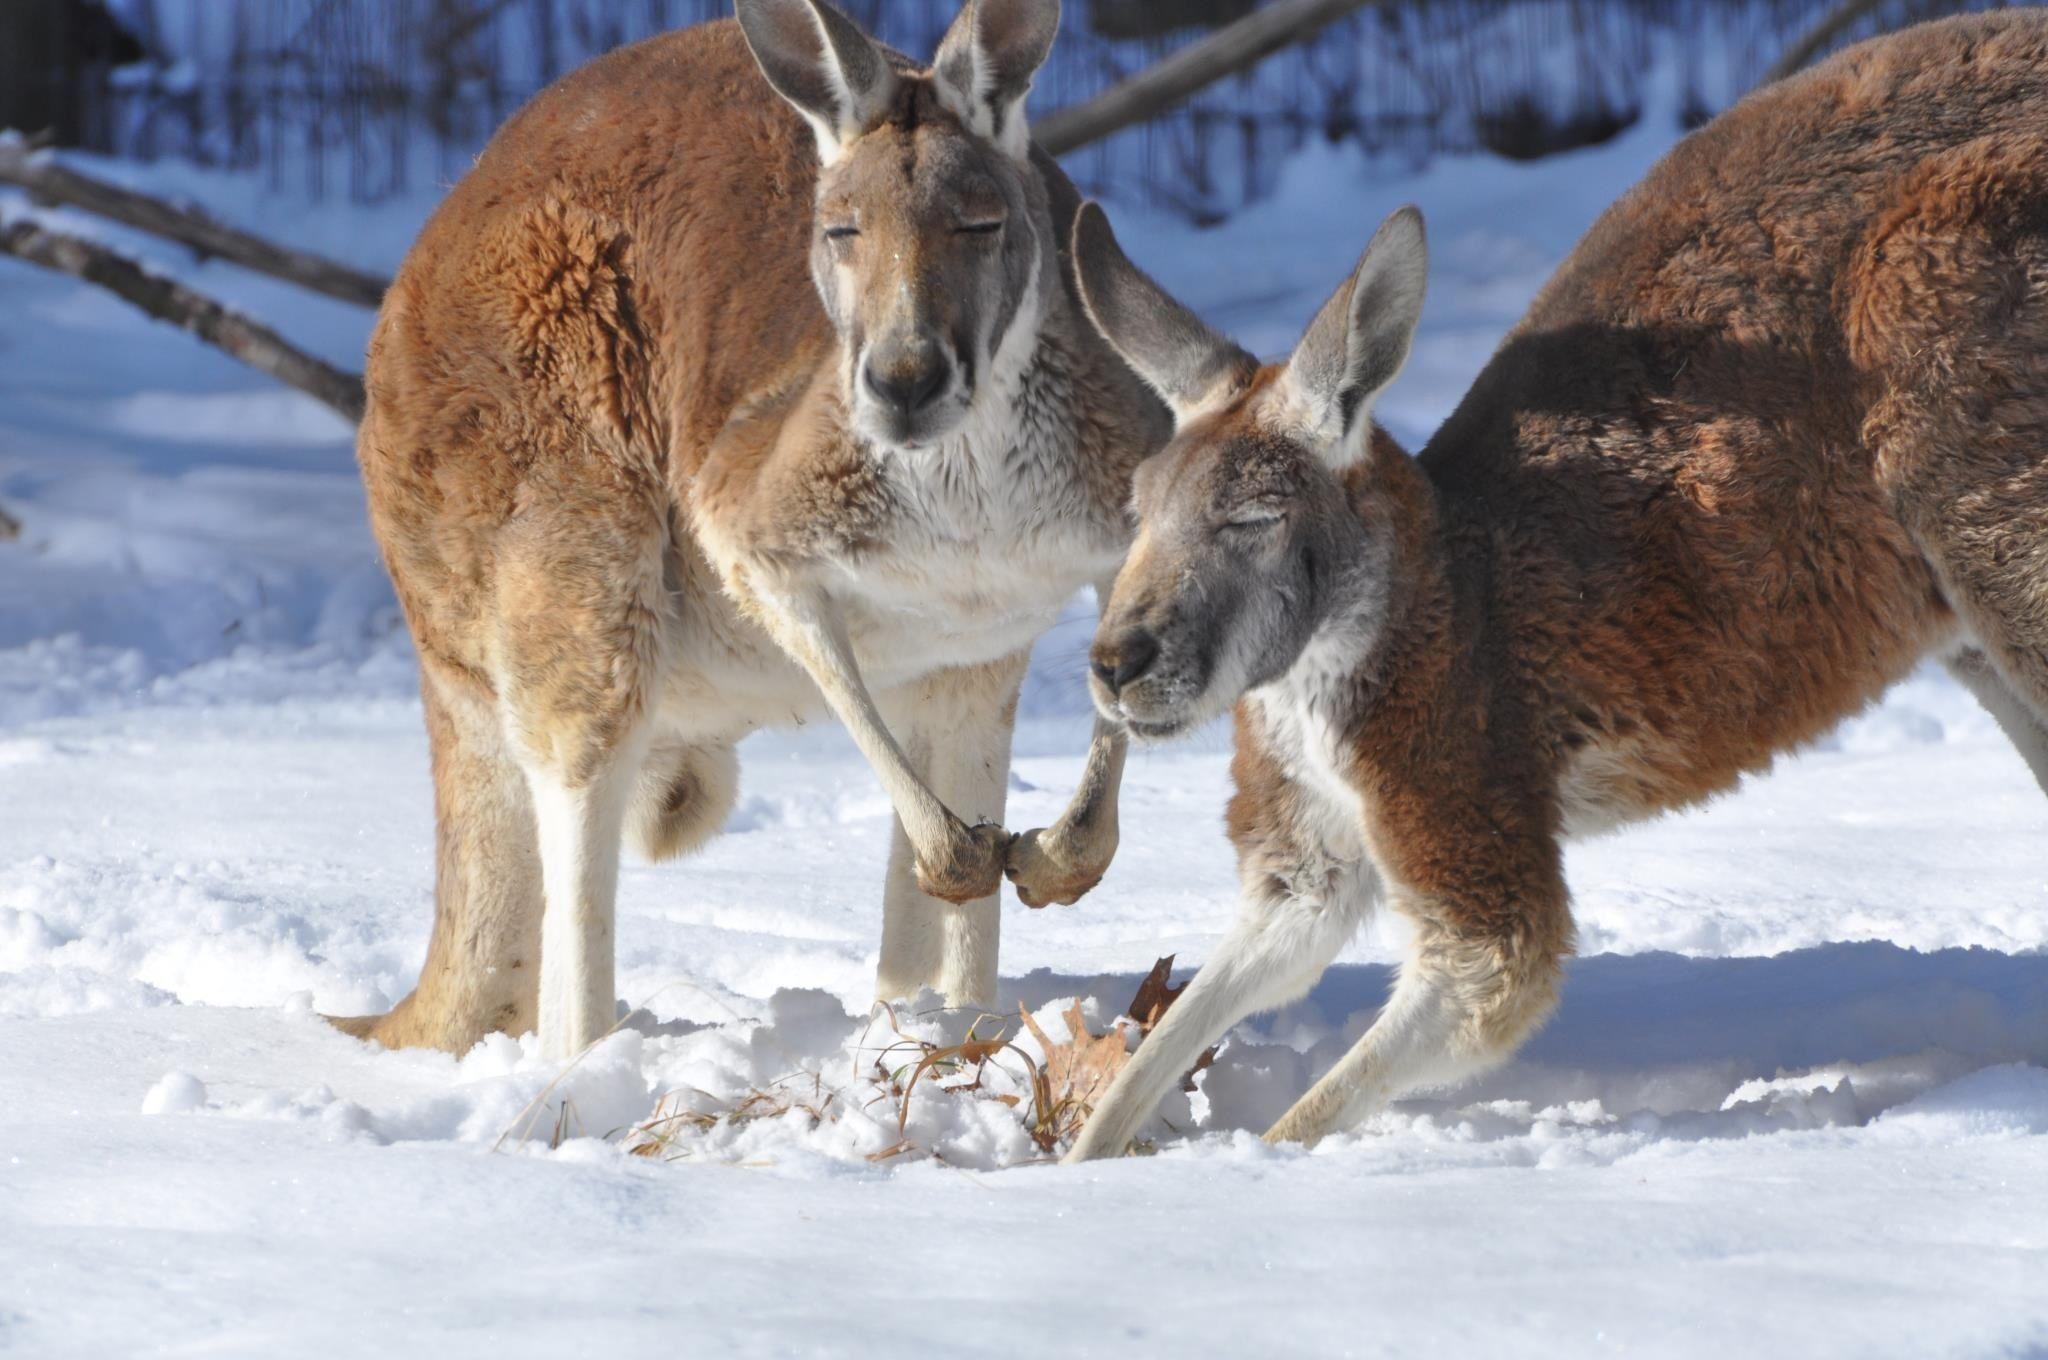 Winter at Binder park